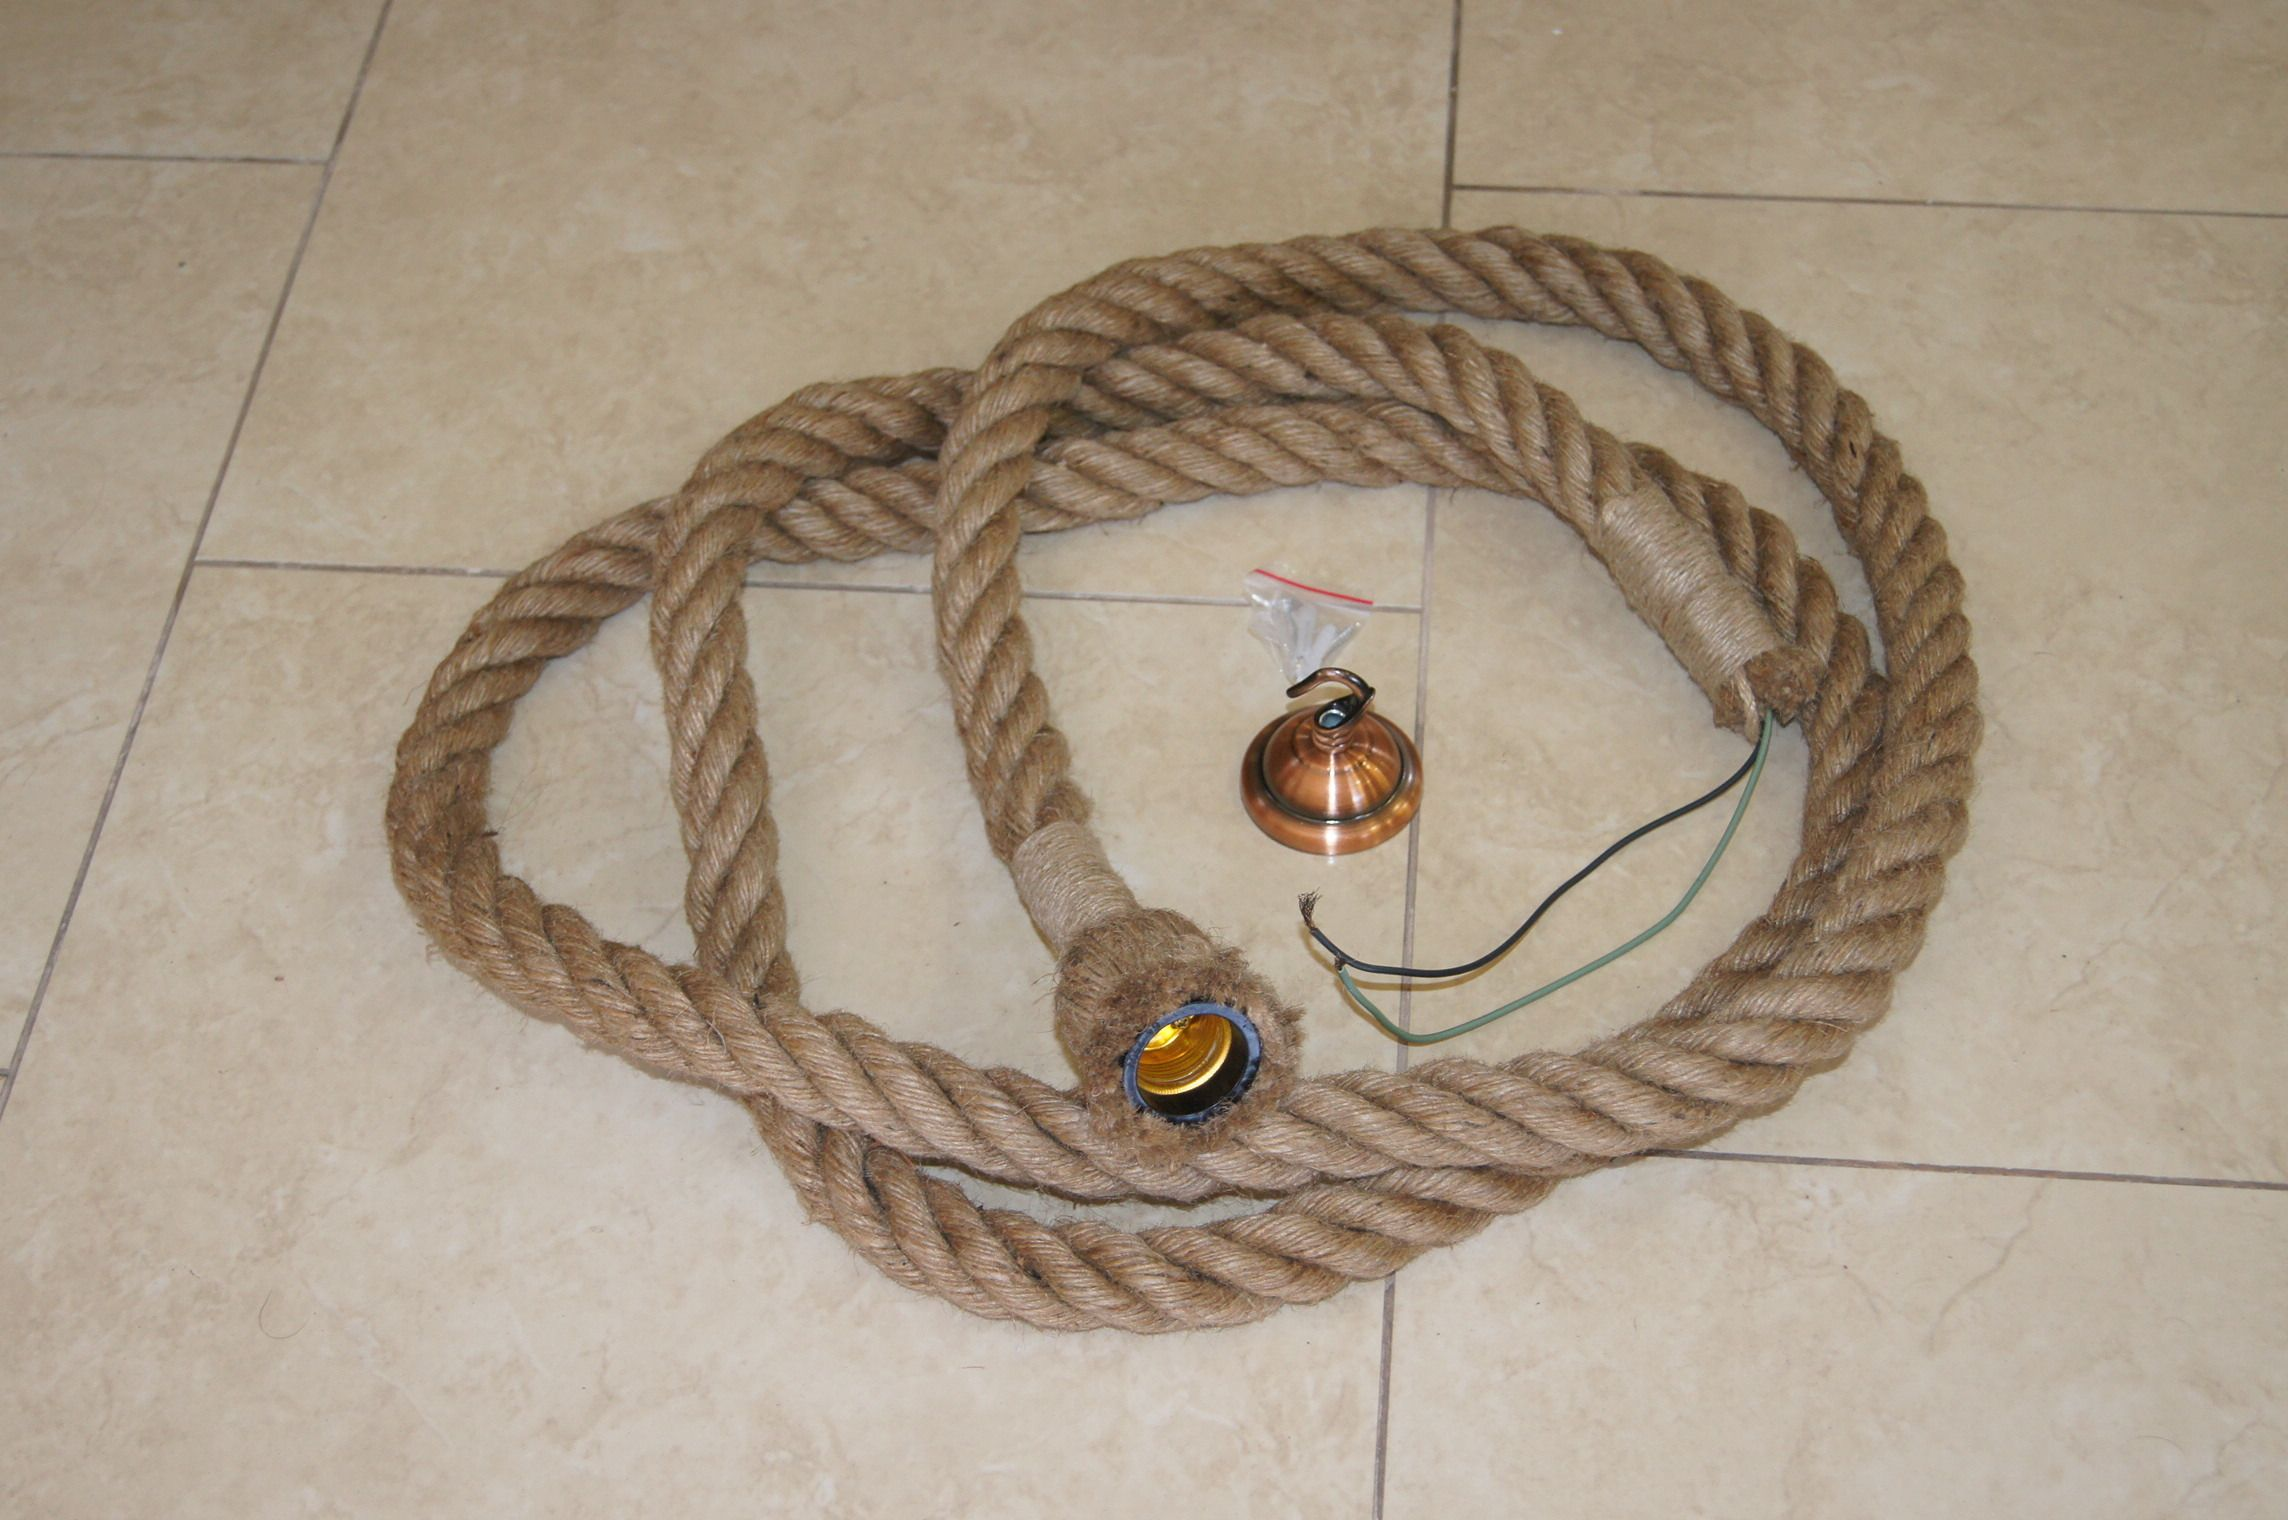 1 Einheit Натуральная камуфляжная веревка Lampe 3 м + Deckenfuß (новый)